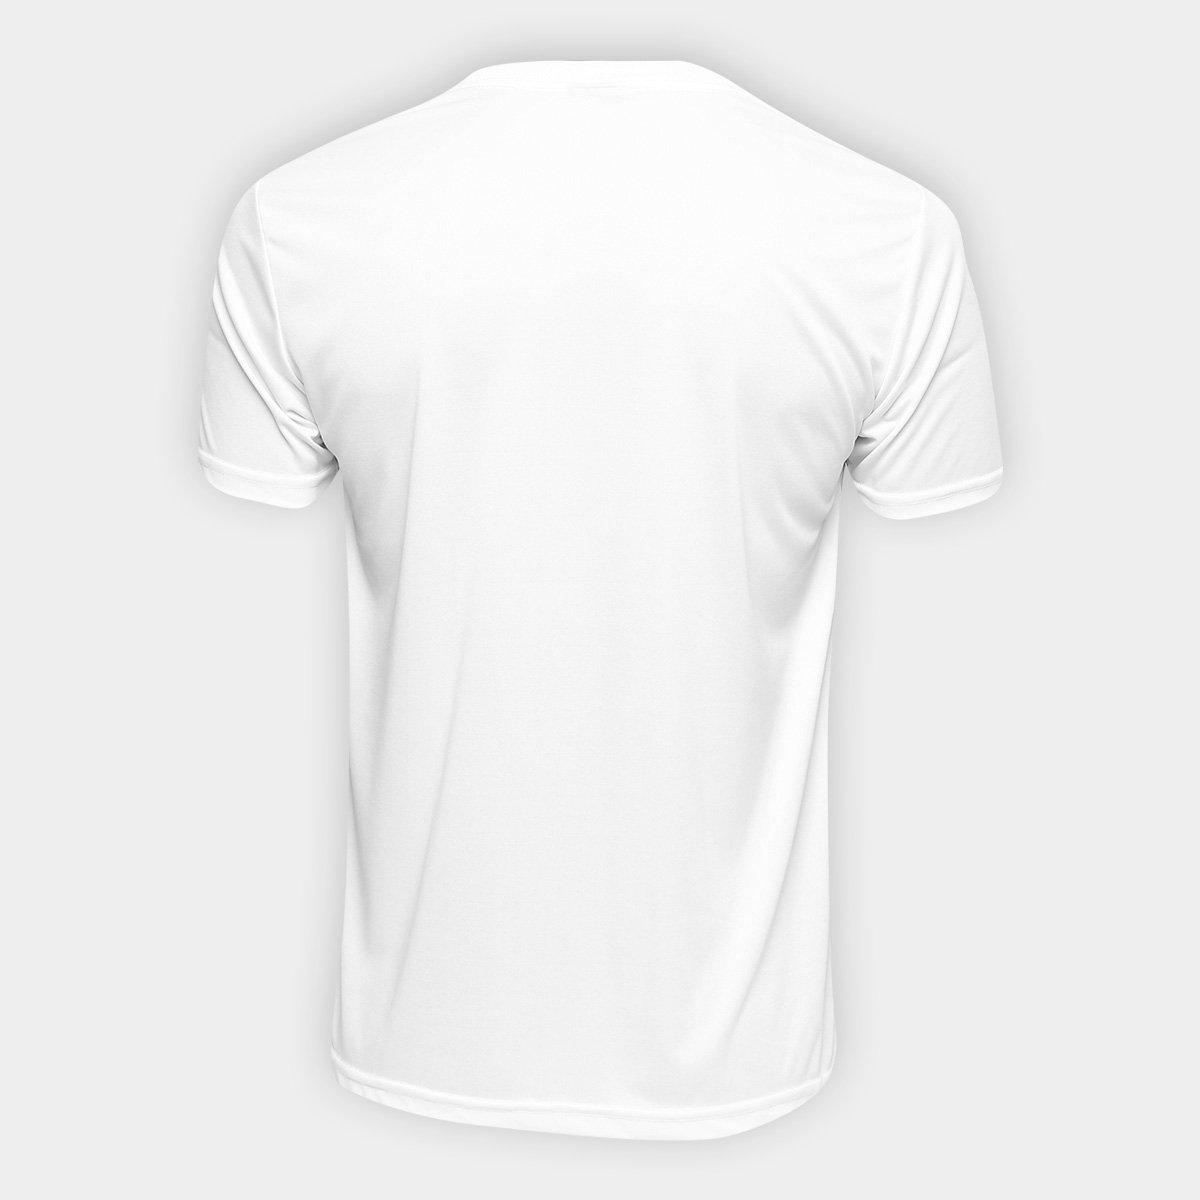 f03a23209aebd ... Camiseta Kappa Shangai Masculina - Branco. EXCLUSIVO